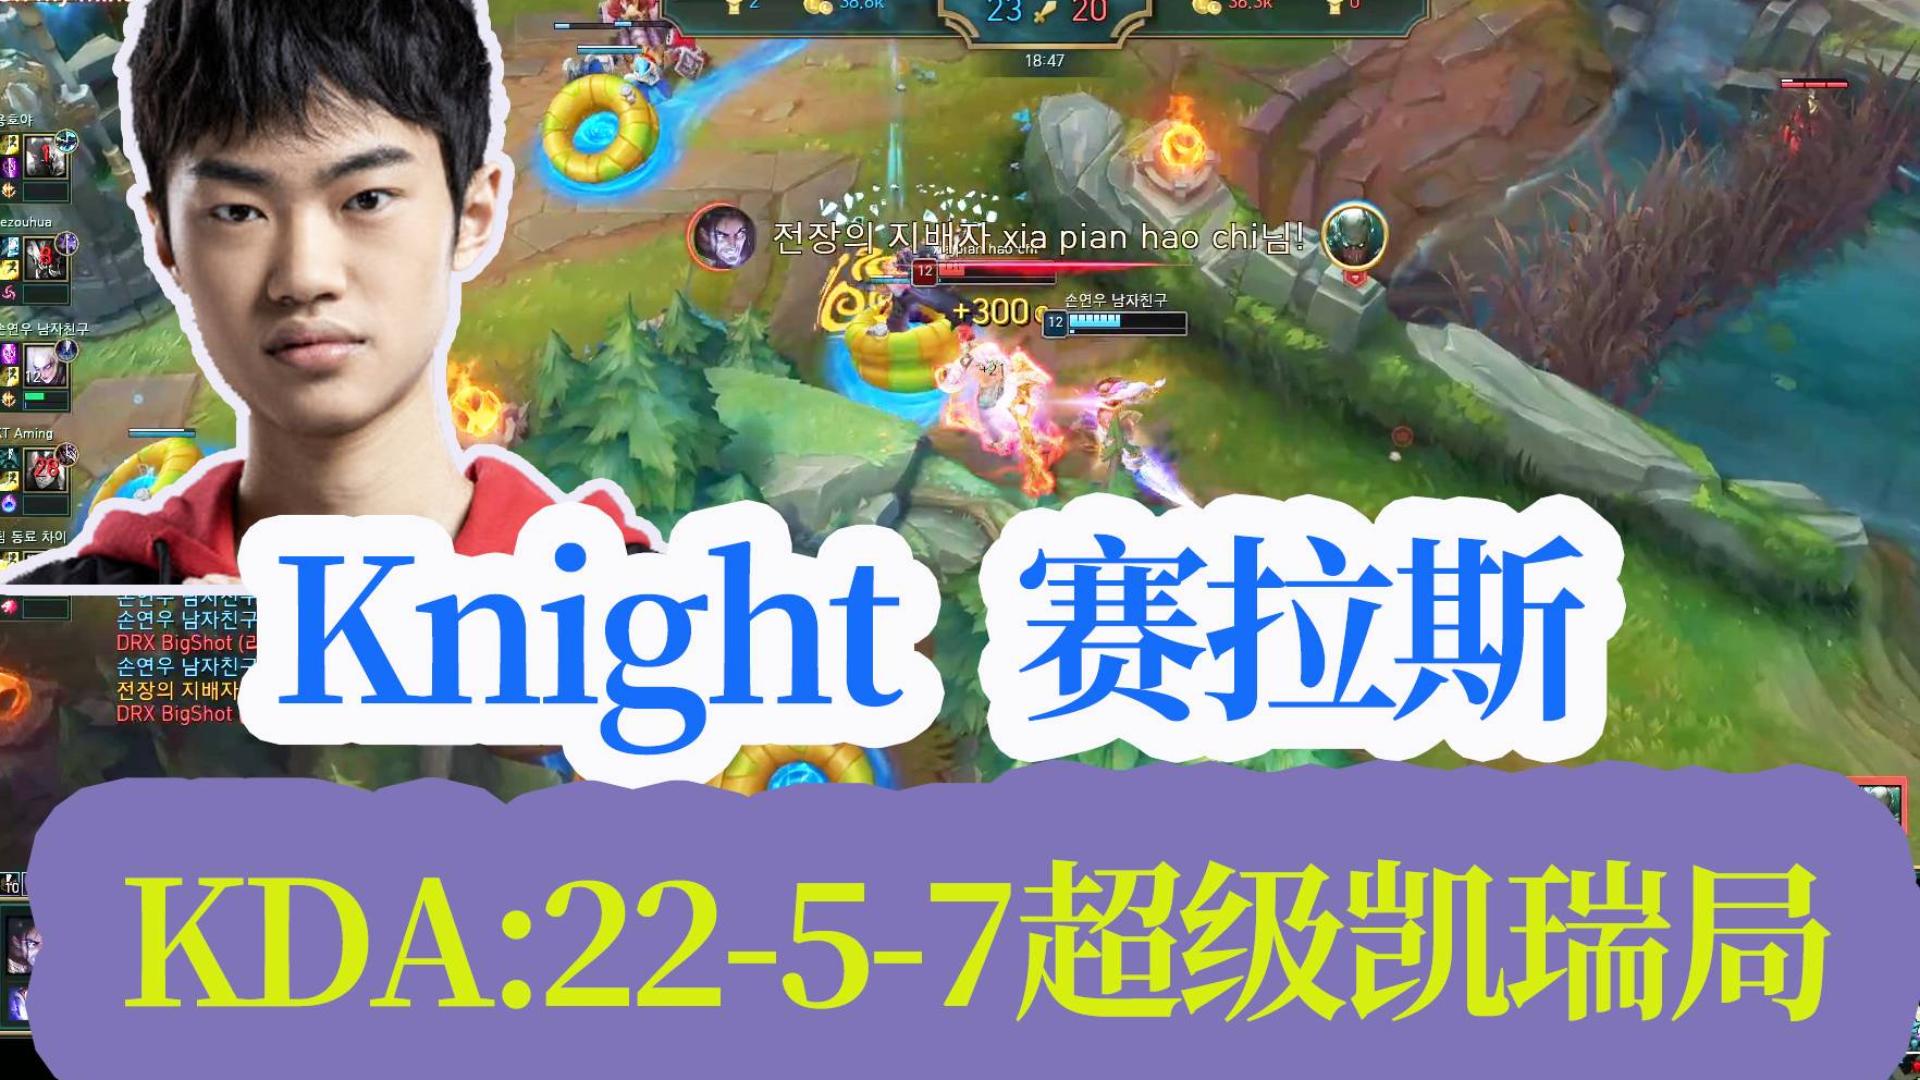 Knight塞拉斯:刘青松Karsa被秀,全场高能不断队友送我来C局